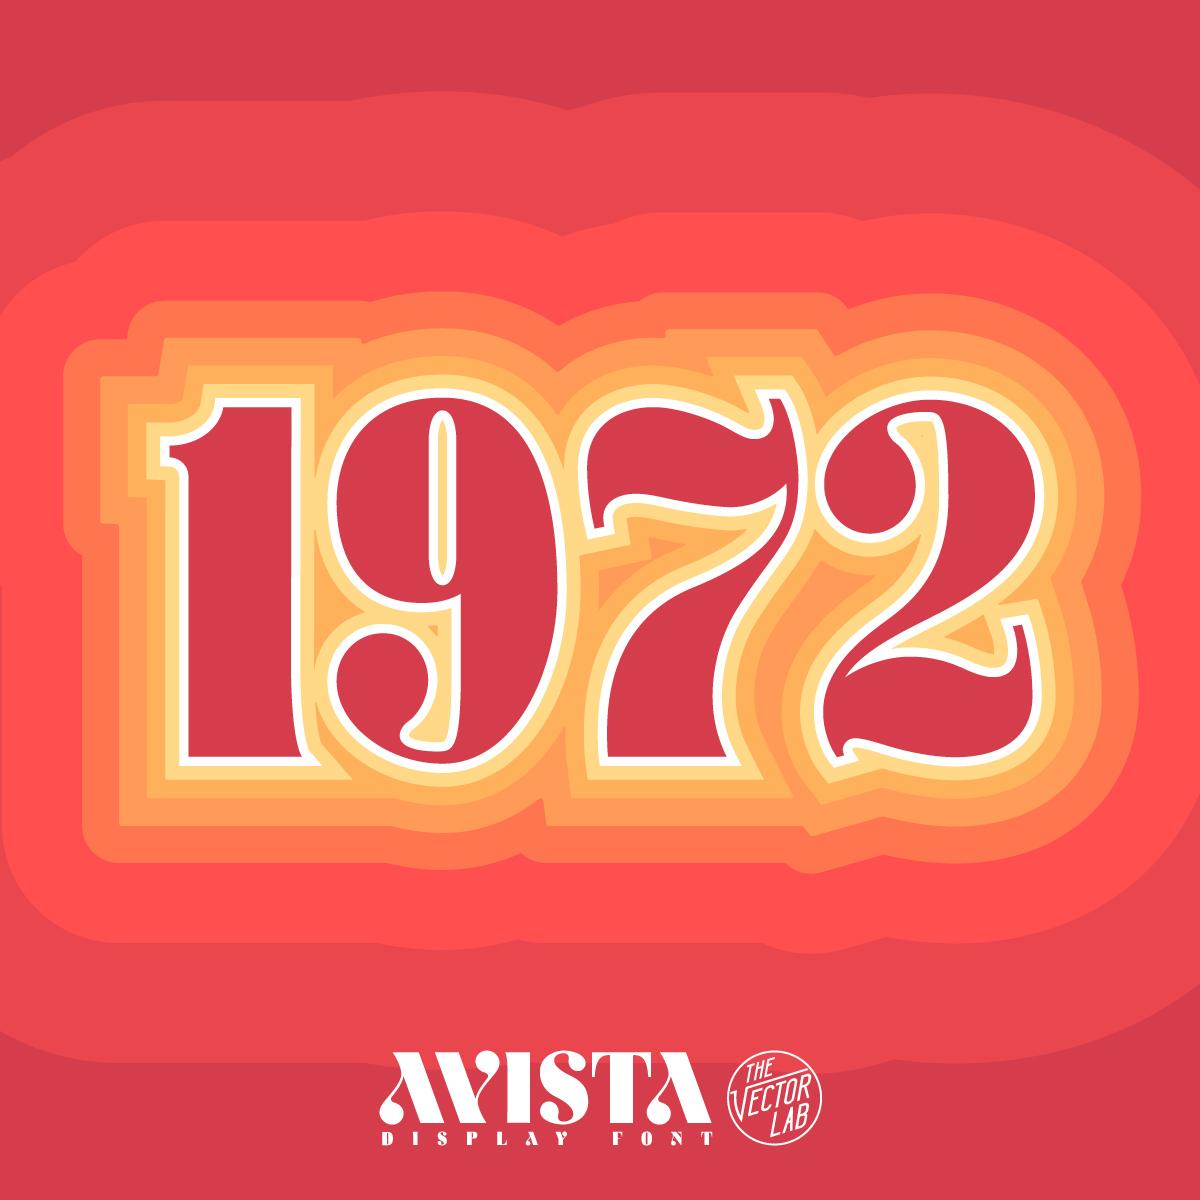 1972 - AVISTA font by Ray Dombroski & TheVectorLab